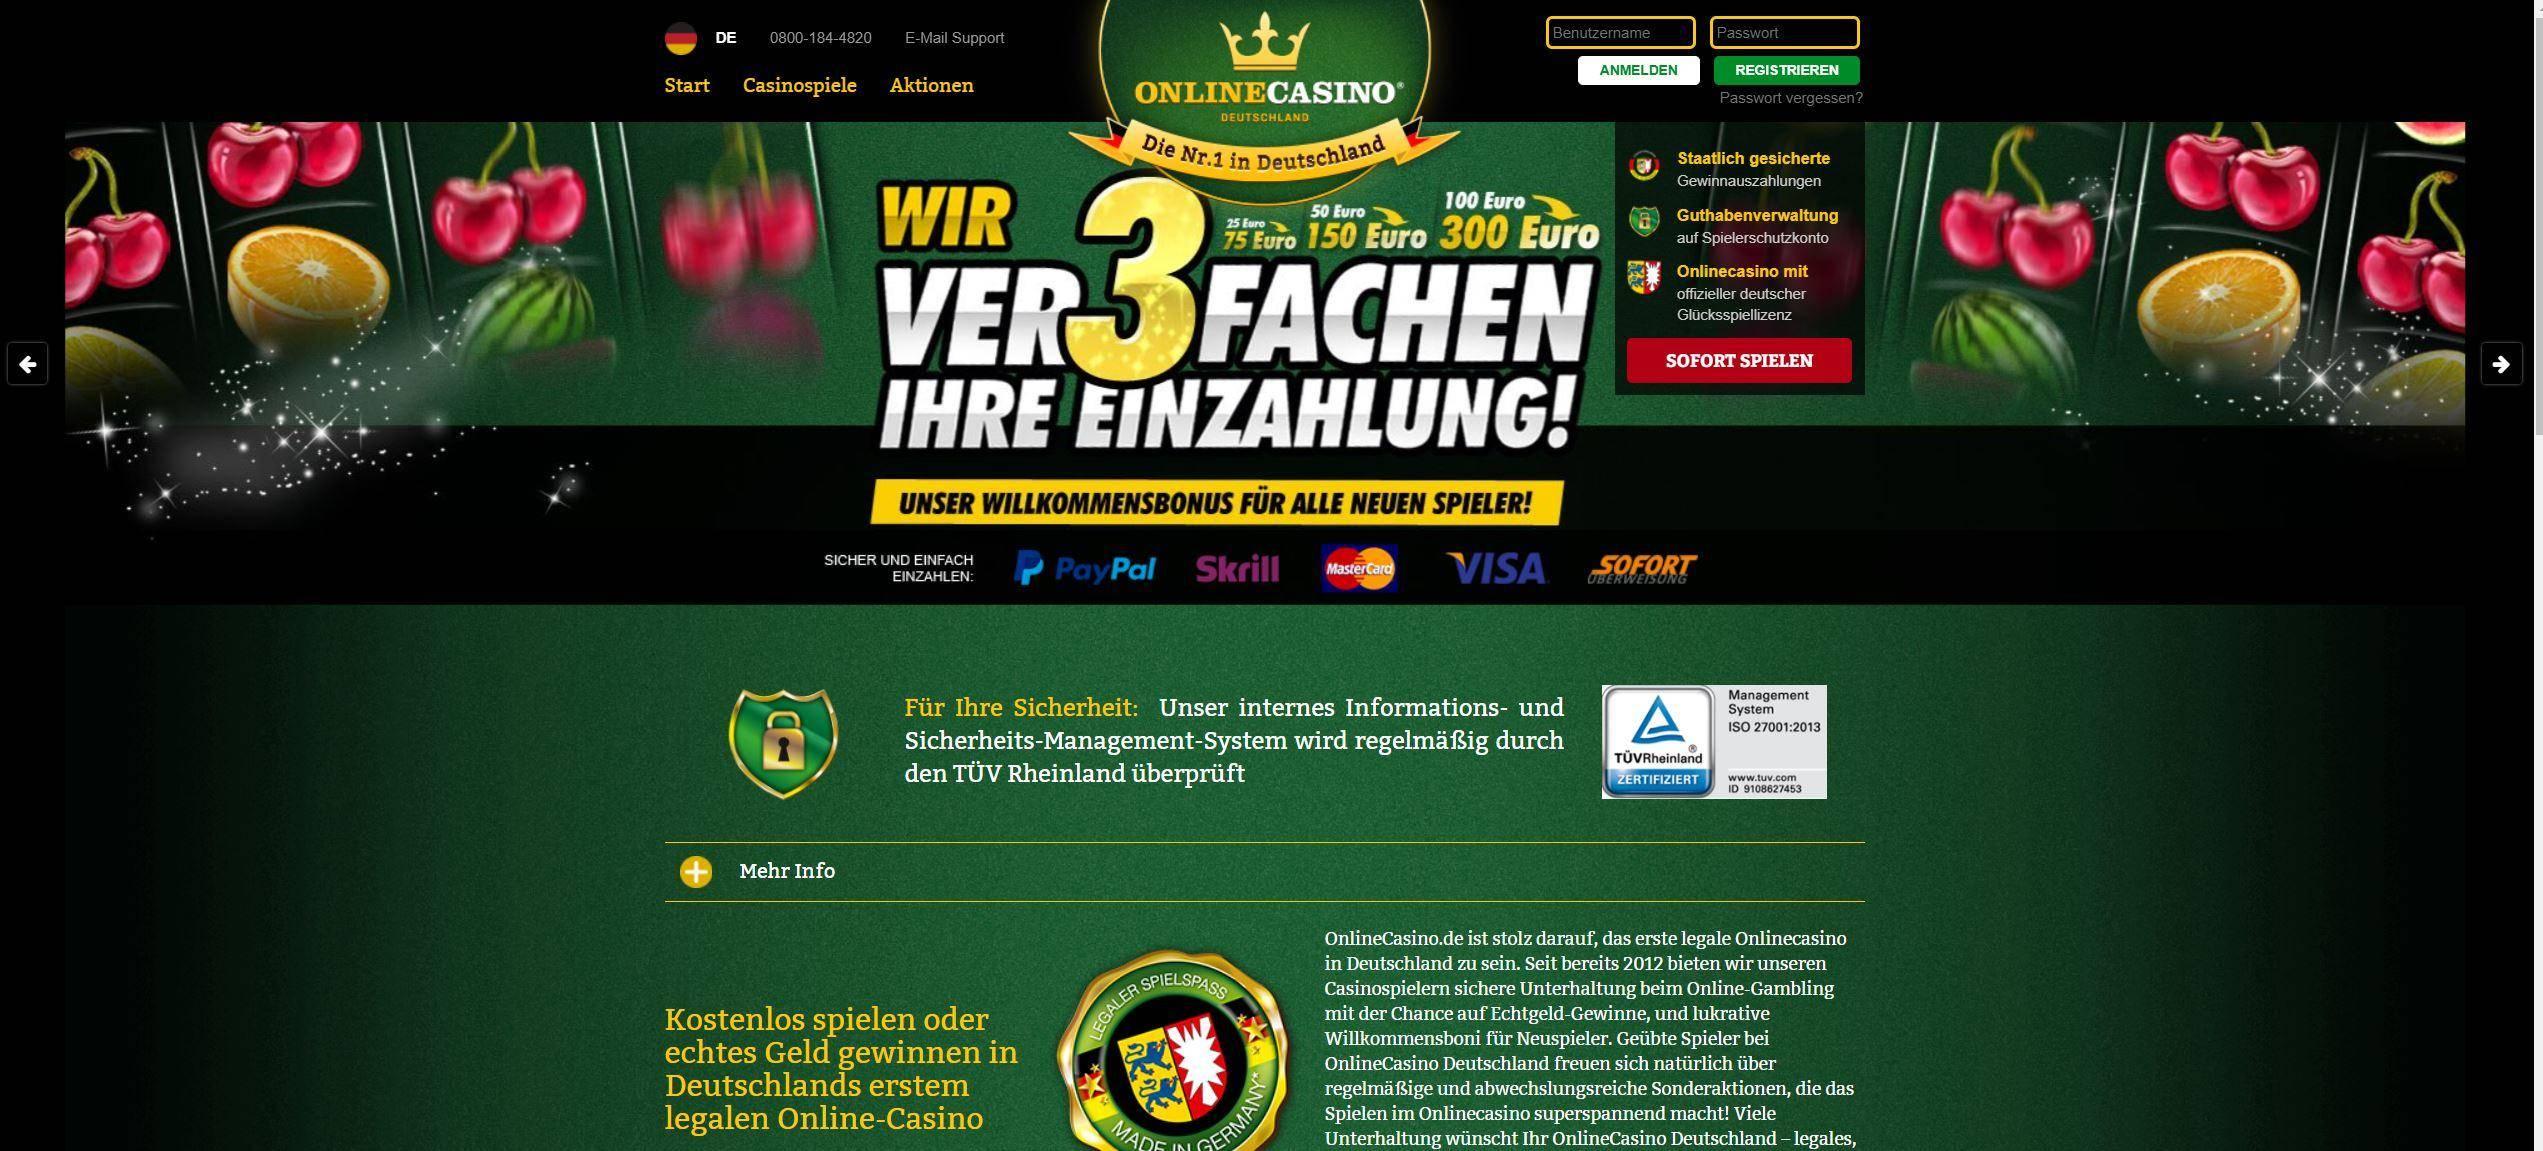 Online Casino - 56197